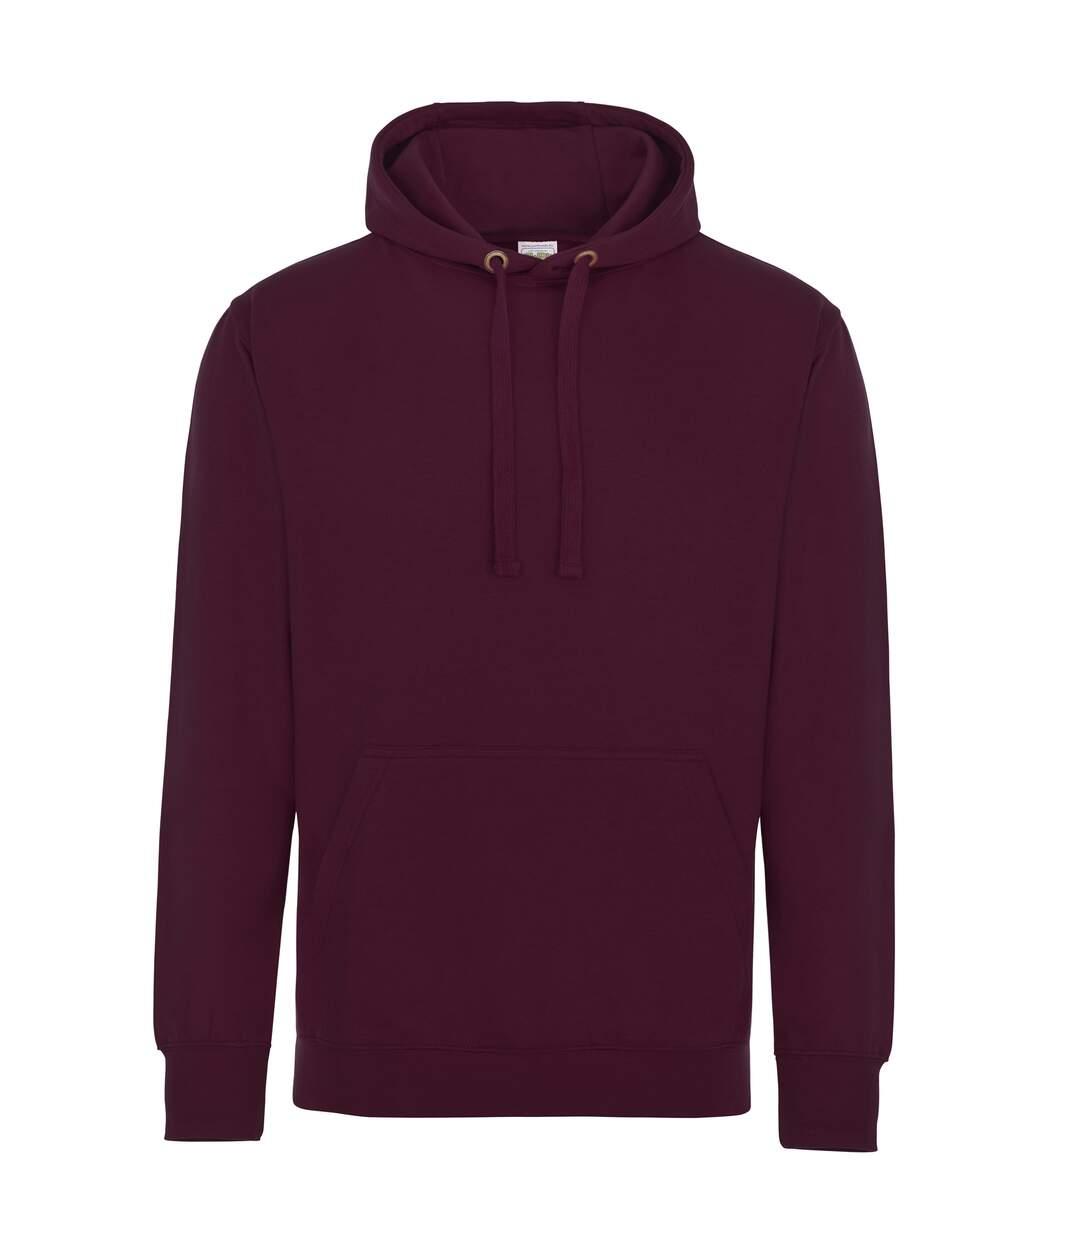 AWDis Just Hoods Adults Unisex Supersoft Hooded Sweatshirt/Hoodie (Hot Pink) - UTRW3926